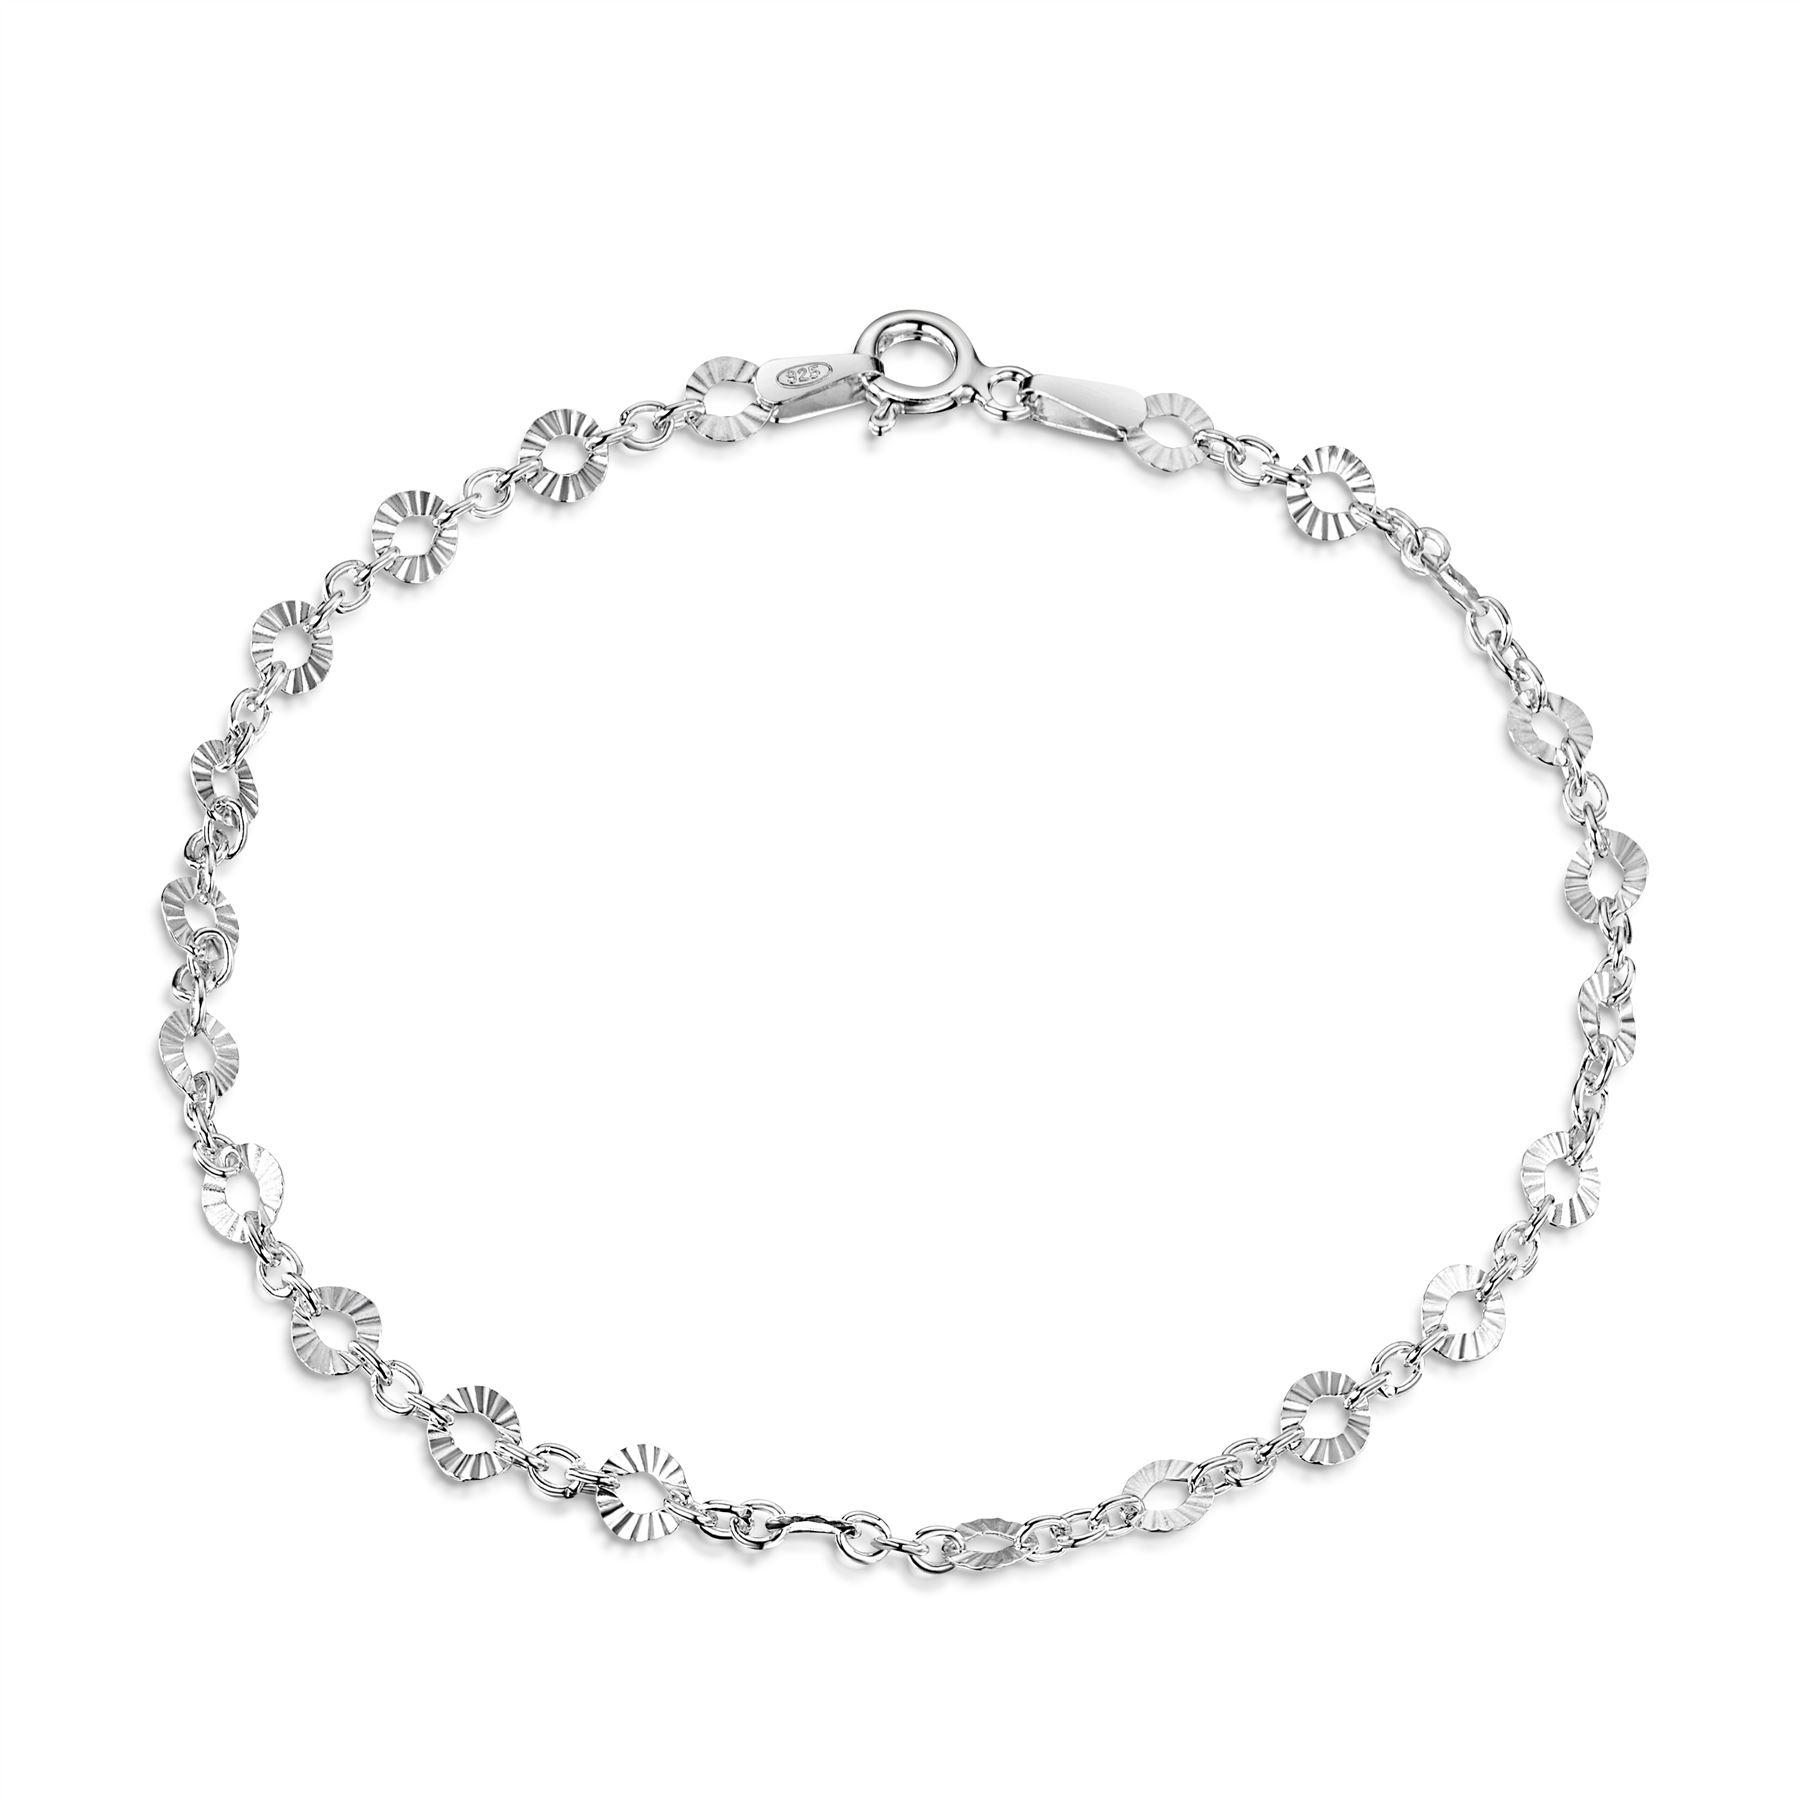 Amberta-Pulsera-en-Autentica-Plata-De-Ley-925-Brazalete-Precioso-para-Mujer miniatura 22